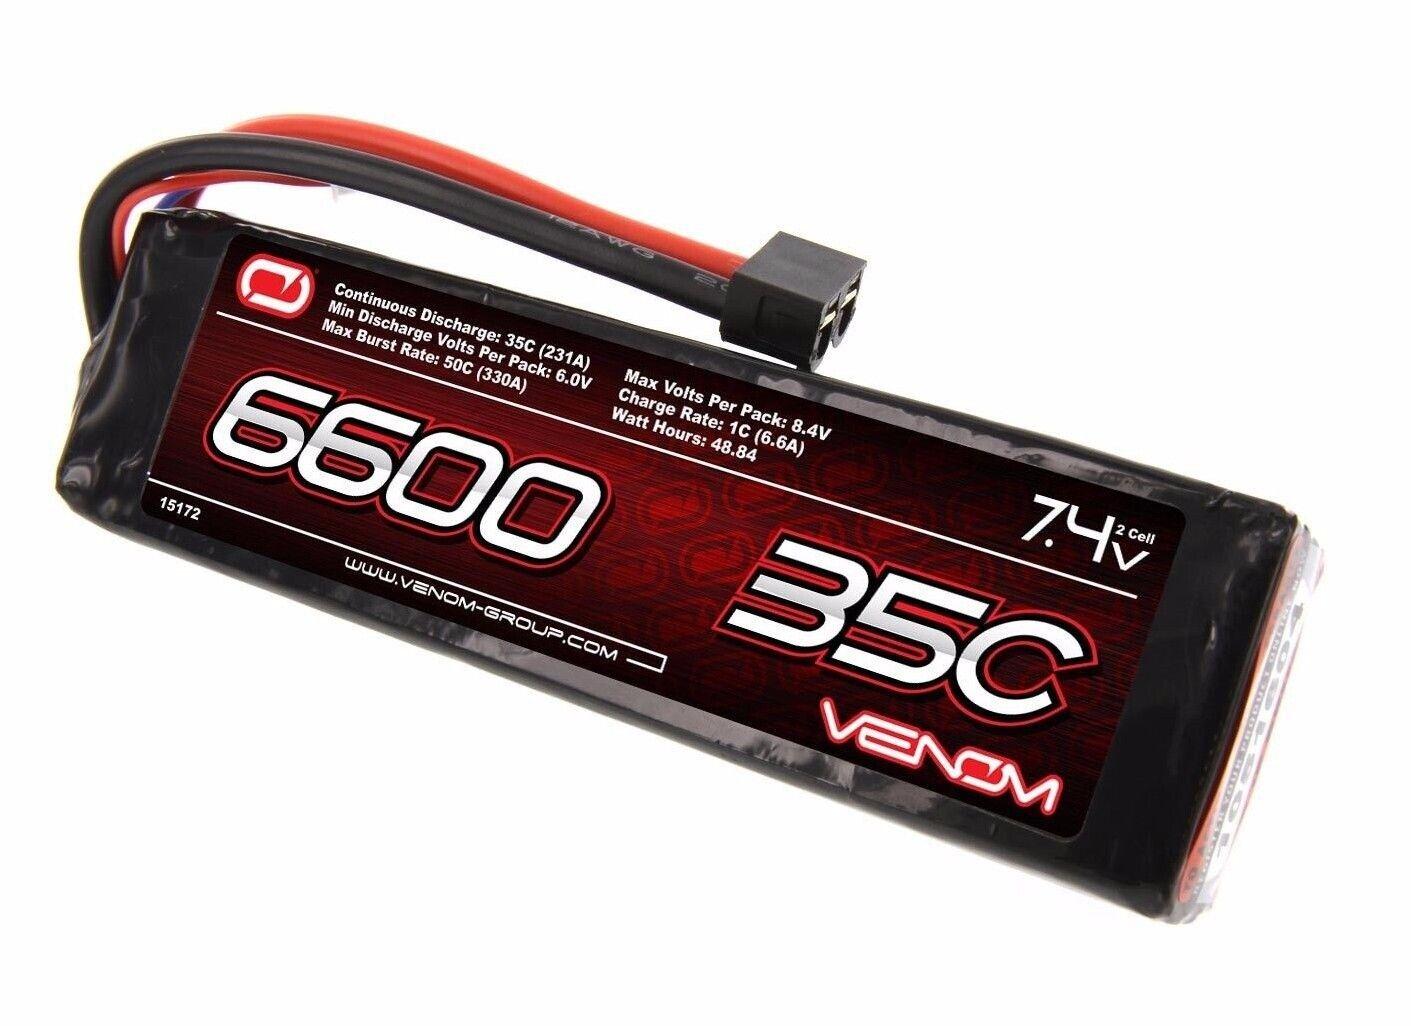 Venom 15172 LIPO 2S 7.4V 6600mAh 35C LIPO BATTERY TRX DEANS EC3 TAMIYA CONNECTER